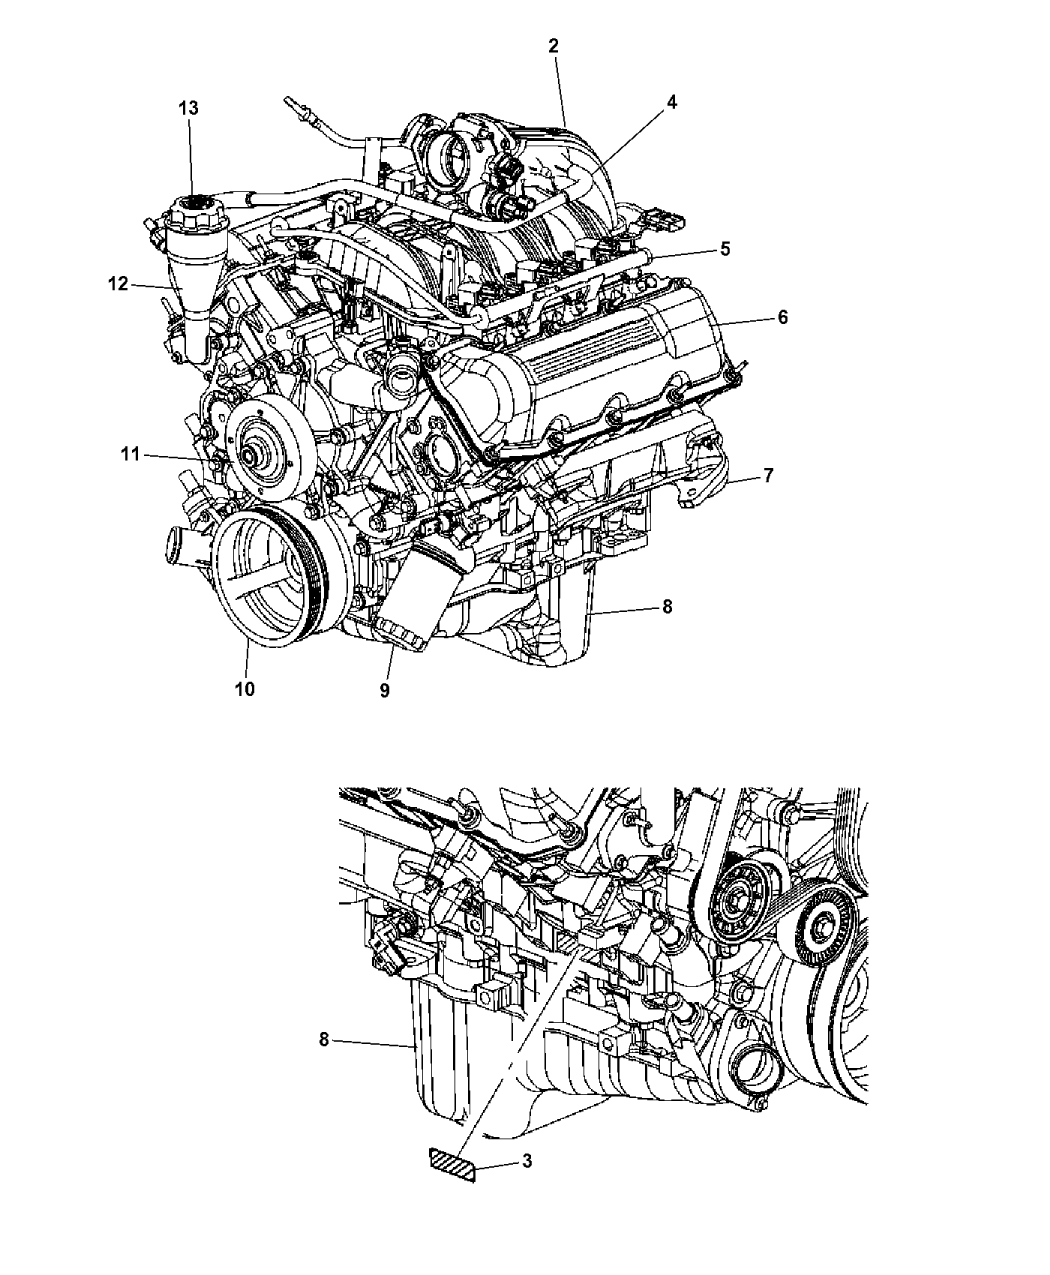 53031102AB - Genuine Mopar RAIL-FUEL